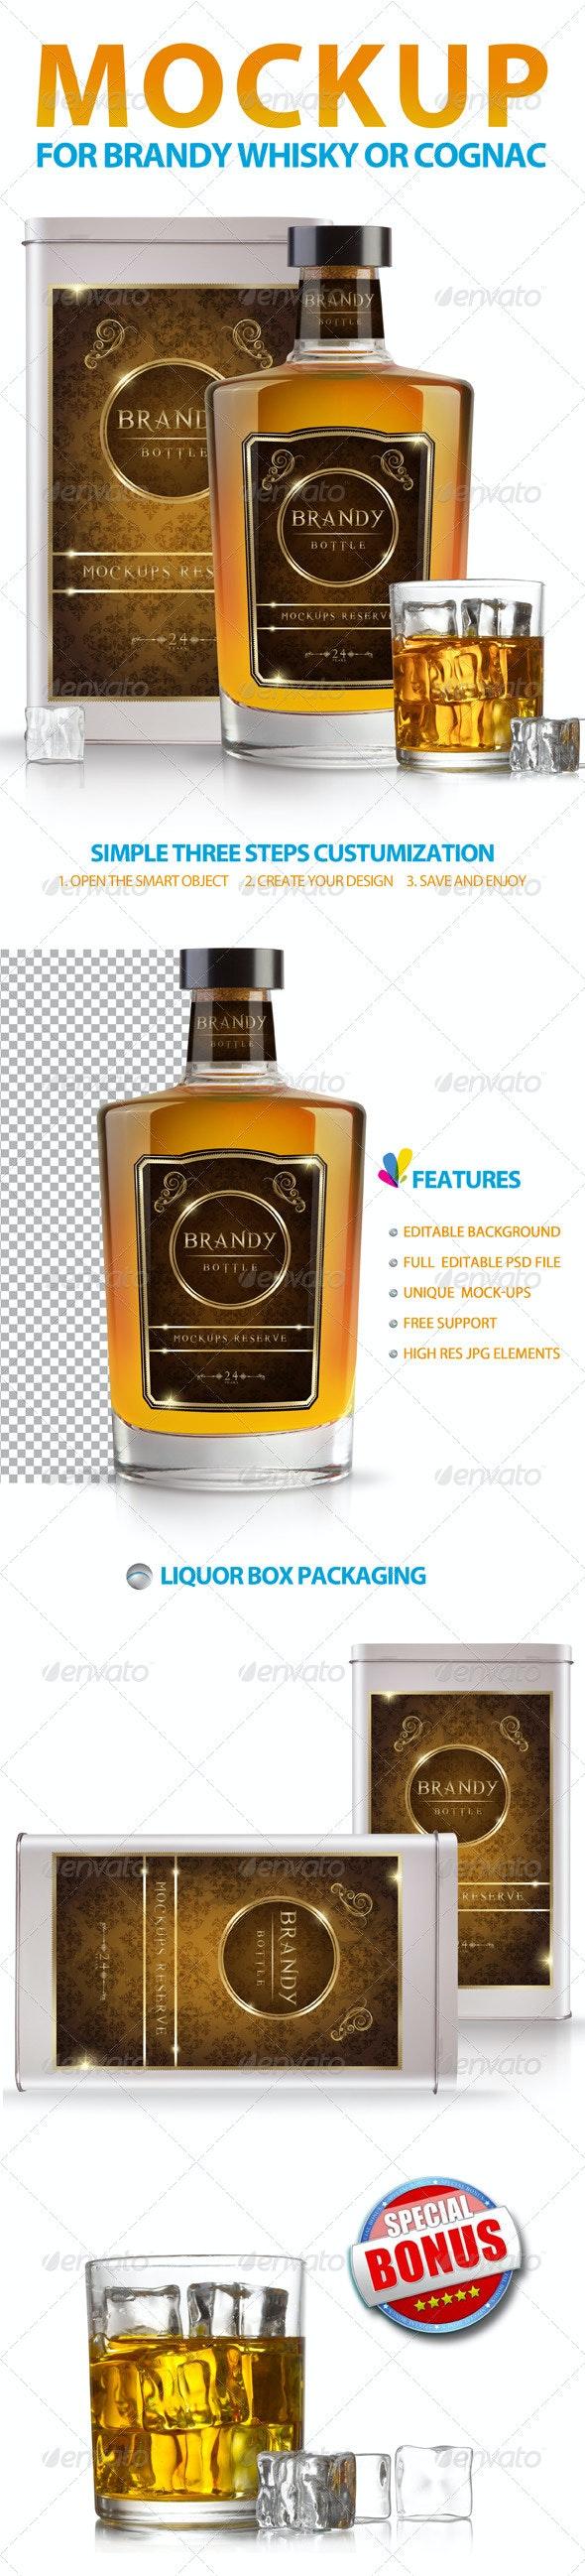 Brandy Whisky or Cognac Mockup - Food and Drink Packaging